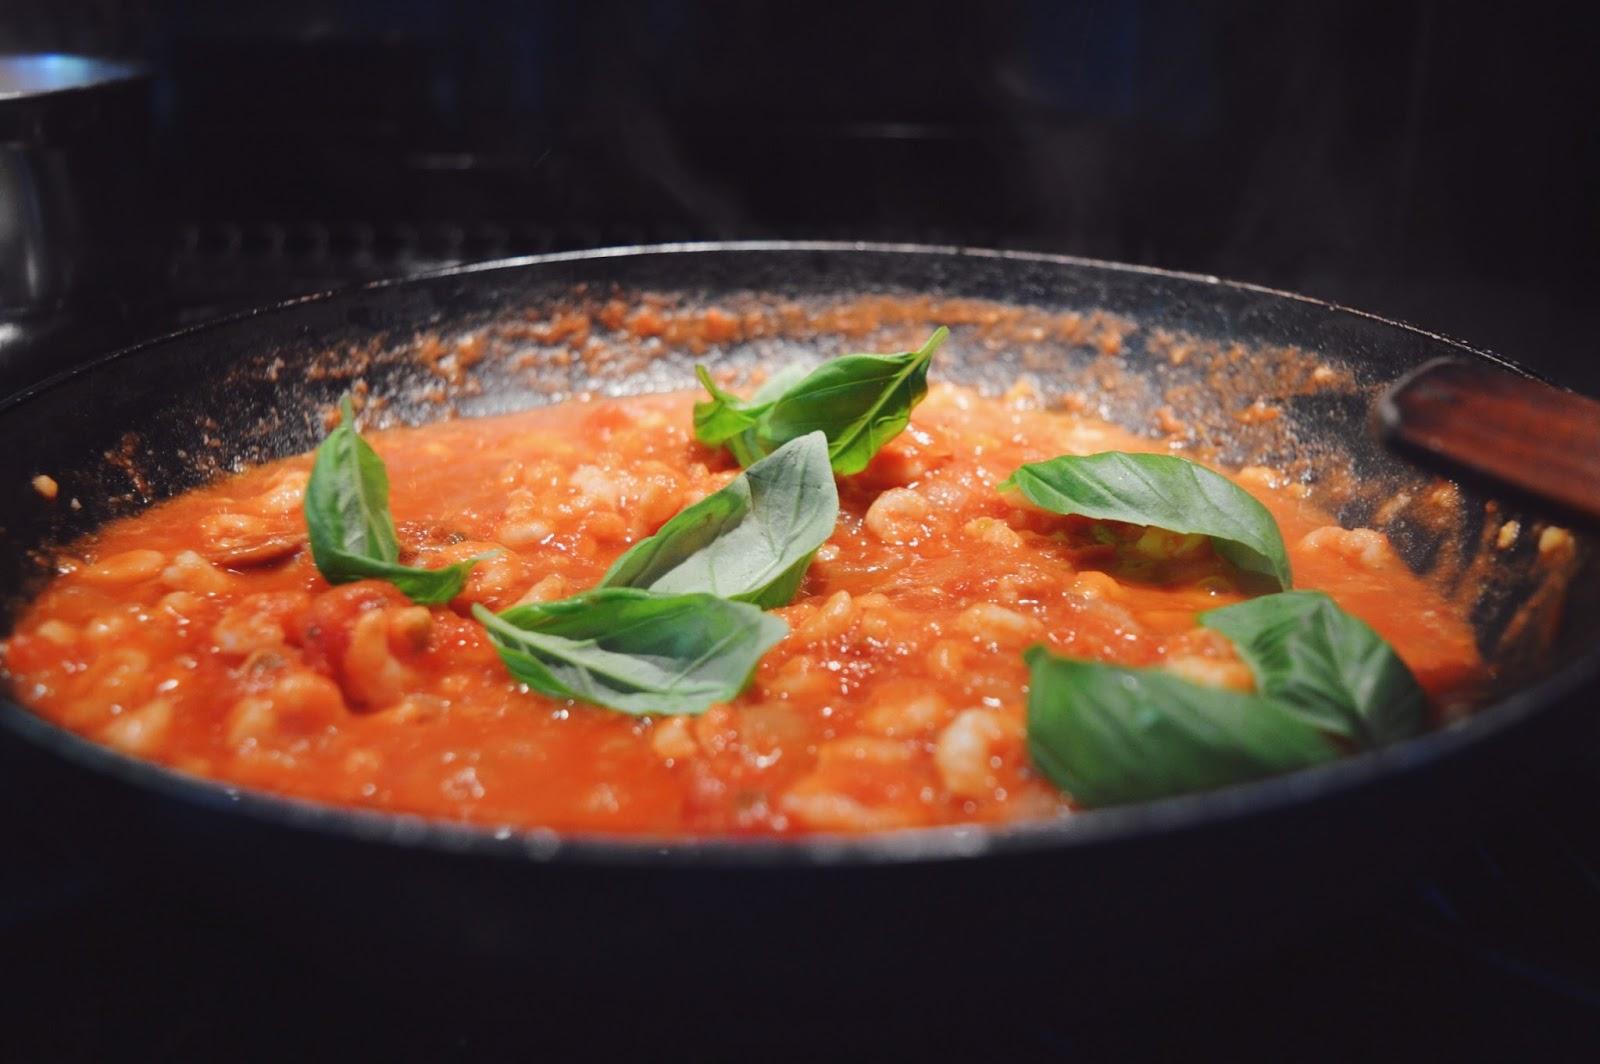 Arrabiata pasta recipe, FashionFake, food bloggers, DegustaBox review